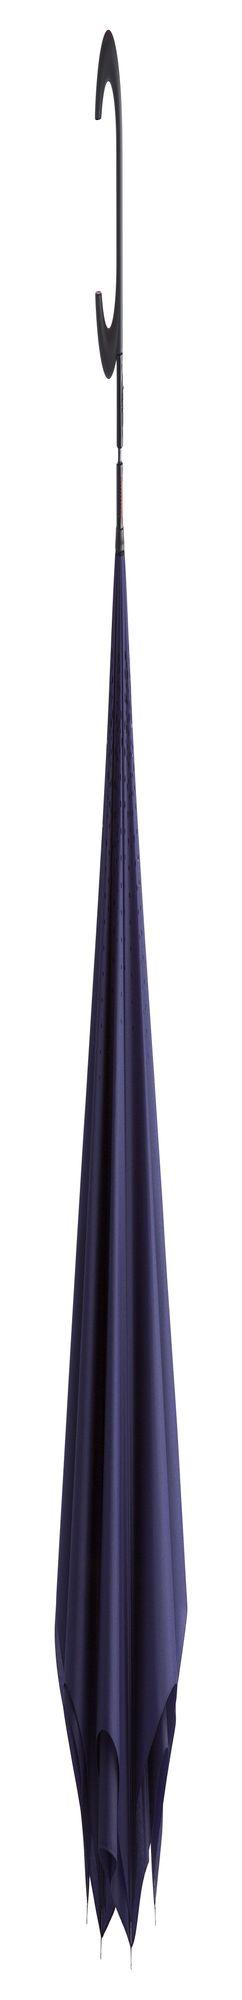 Зонт наоборот Unit ReStyle, трость, темно-синий фото